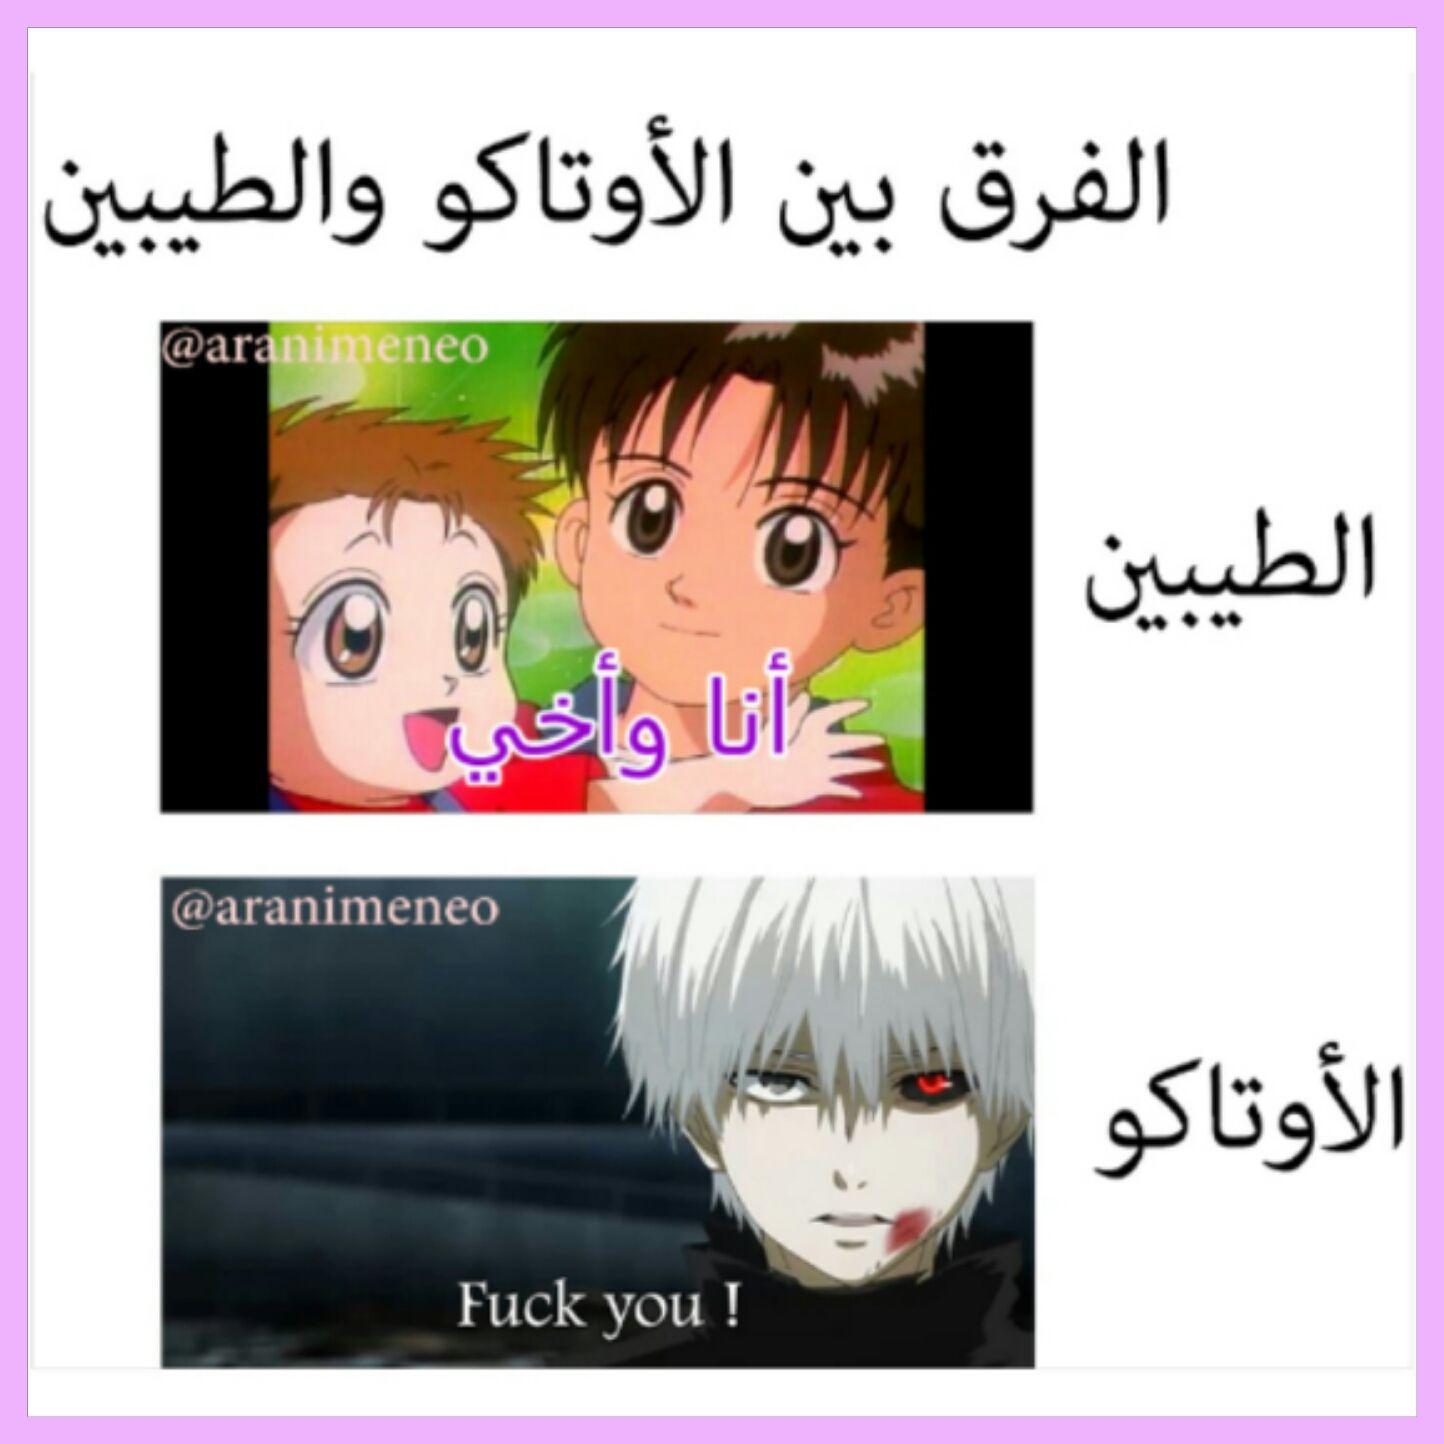 Pin By Sos Not Sus On Qouts Memes Anime اقباسات ميمز انمي Anime Jokes Anime Funny Funny Picture Jokes